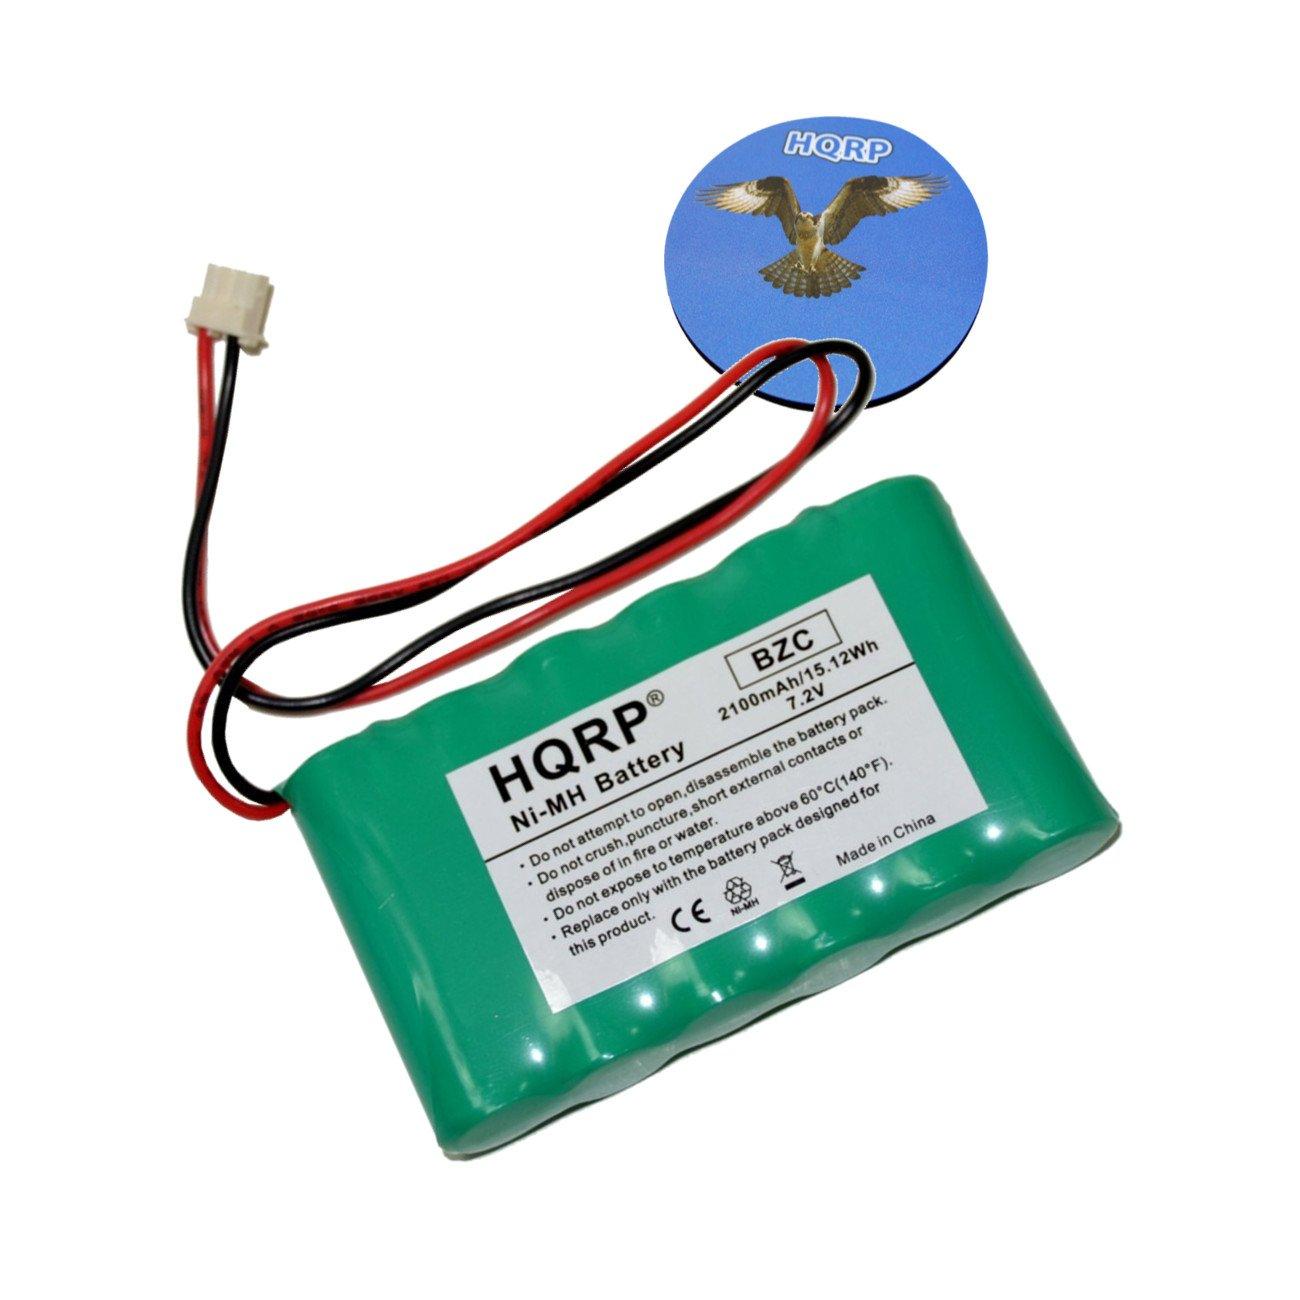 HQRP 2100mAh High Capacity Backup Battery for Ademco Honeywell Lynx Plus Touch L3000 L5000 L5100 L5200 L7000 LYNXRCHKITSHA LYNXRCHKIT-SHA 300-03866 WALYNX-RCHB-SHA Replacement + HQRP Coaster